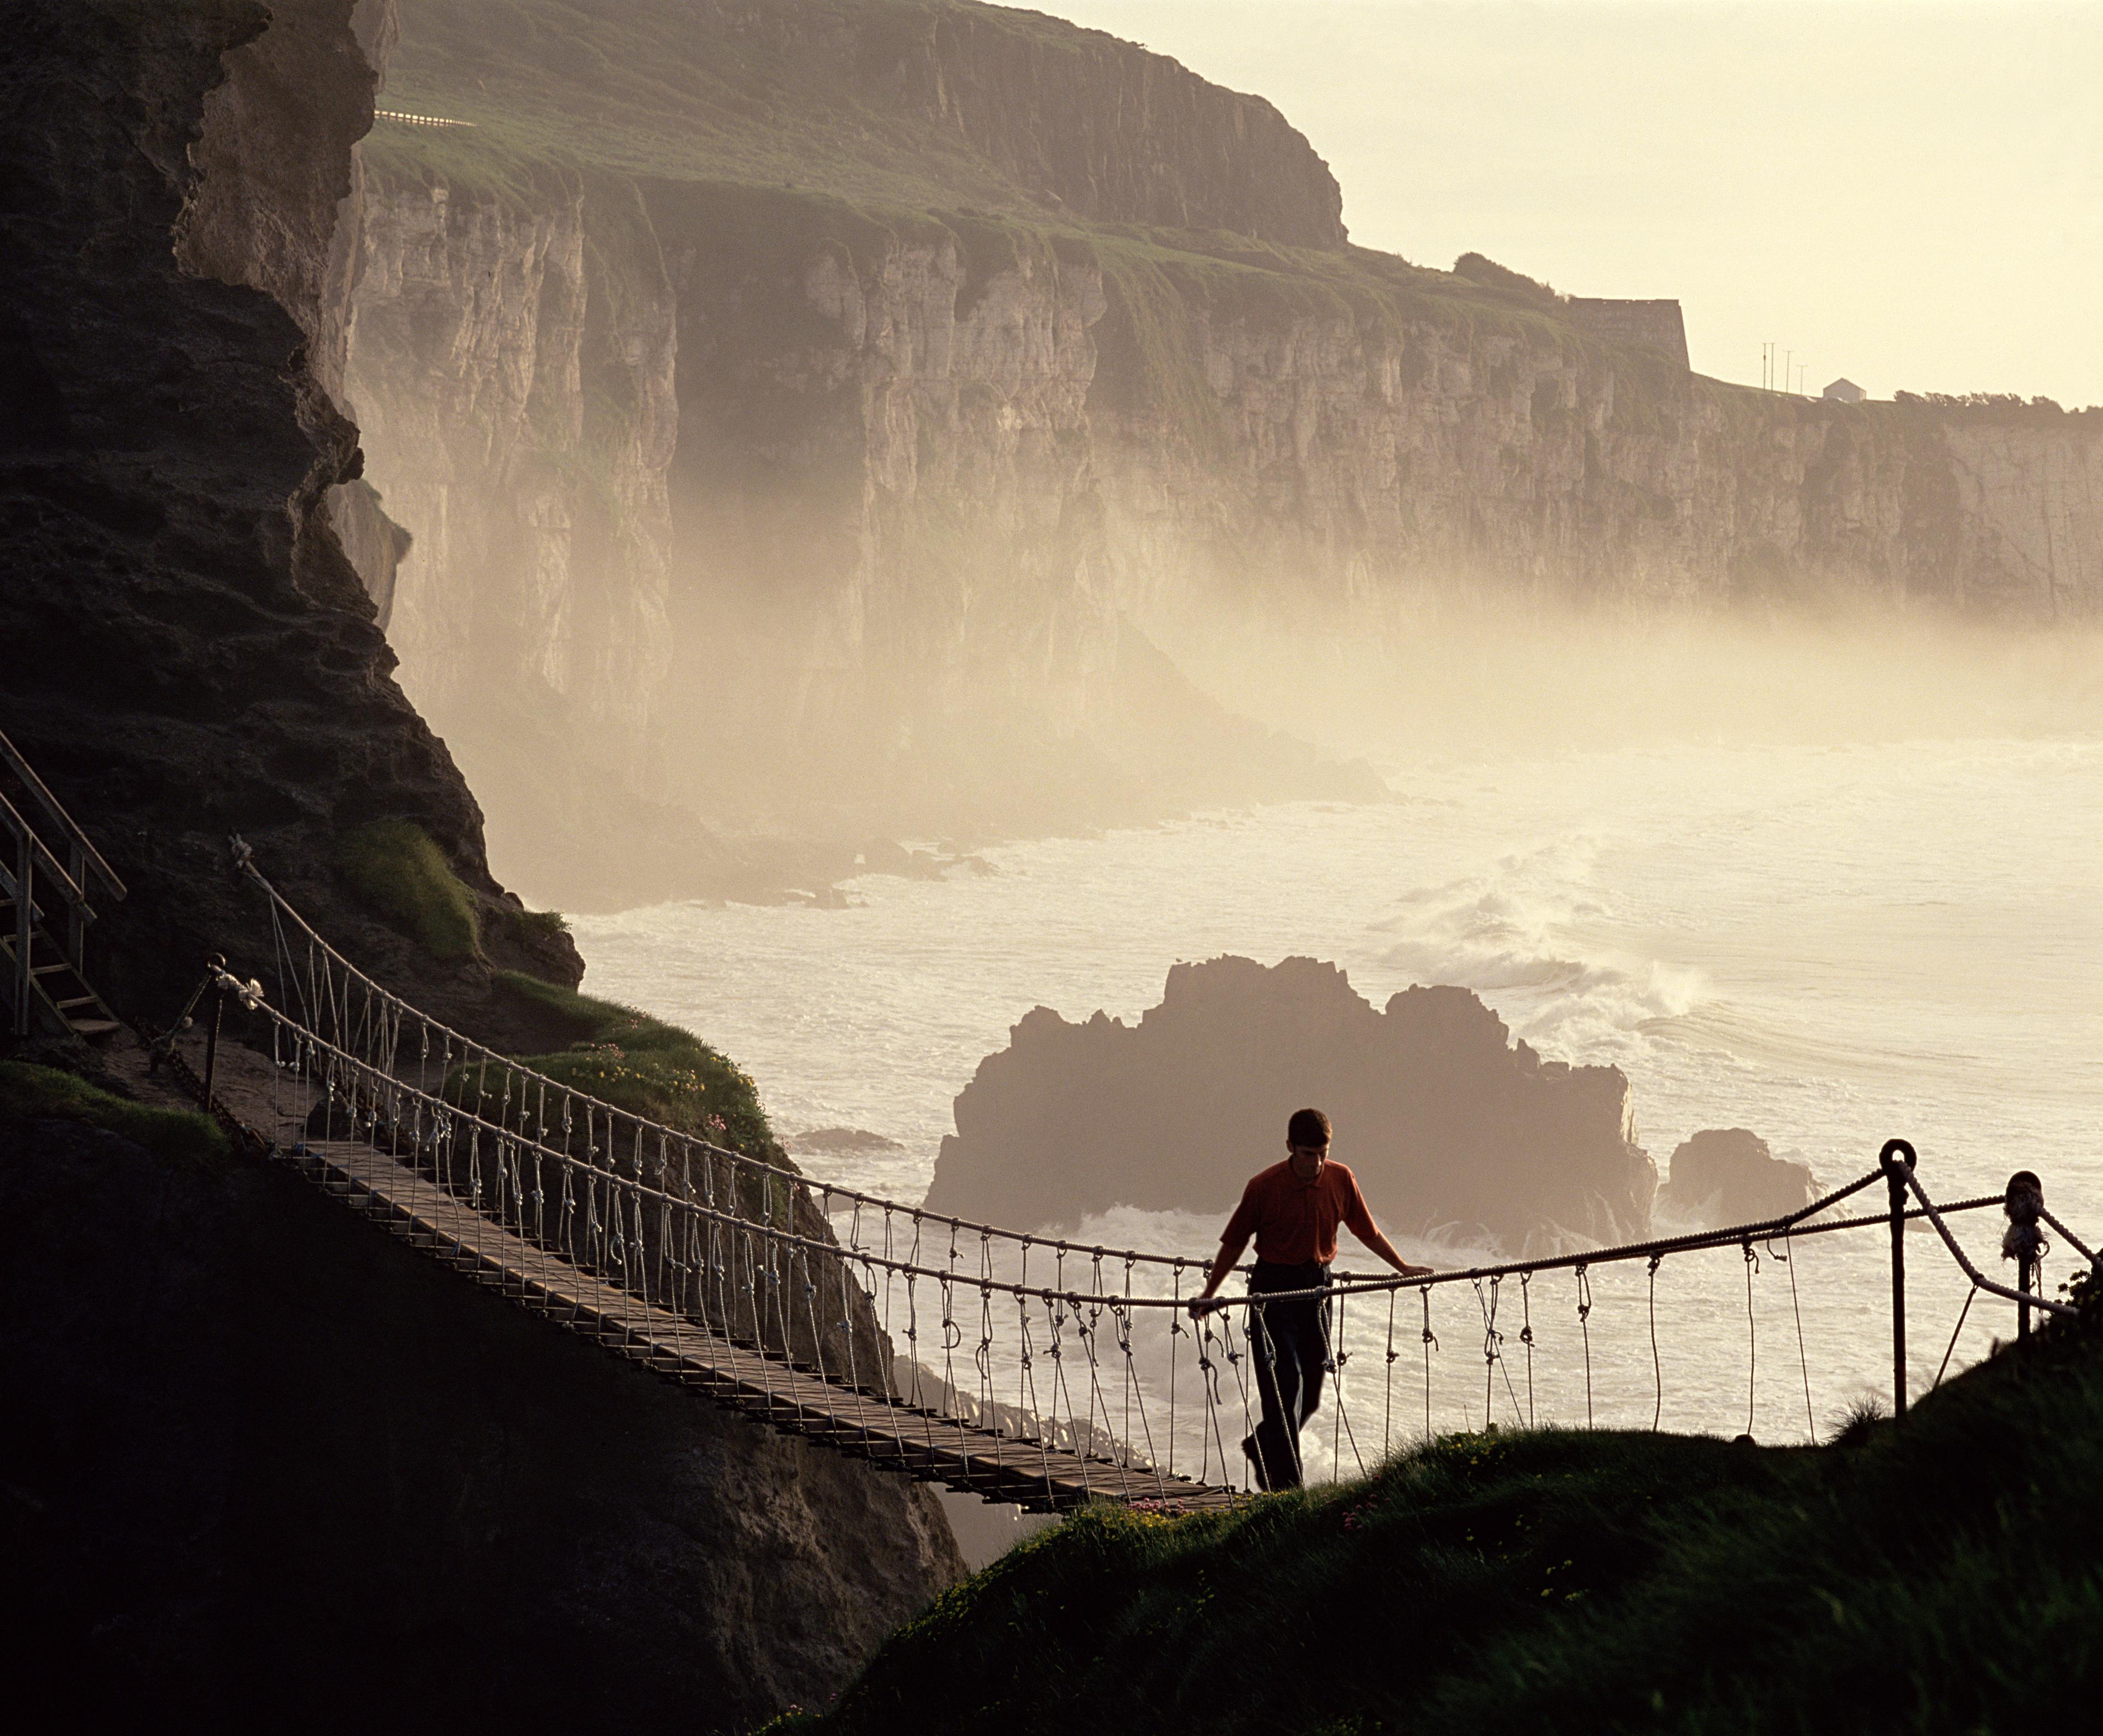 Carrick-a-Rede-Bridge-Contea di Antrim-Irlanda del Nord